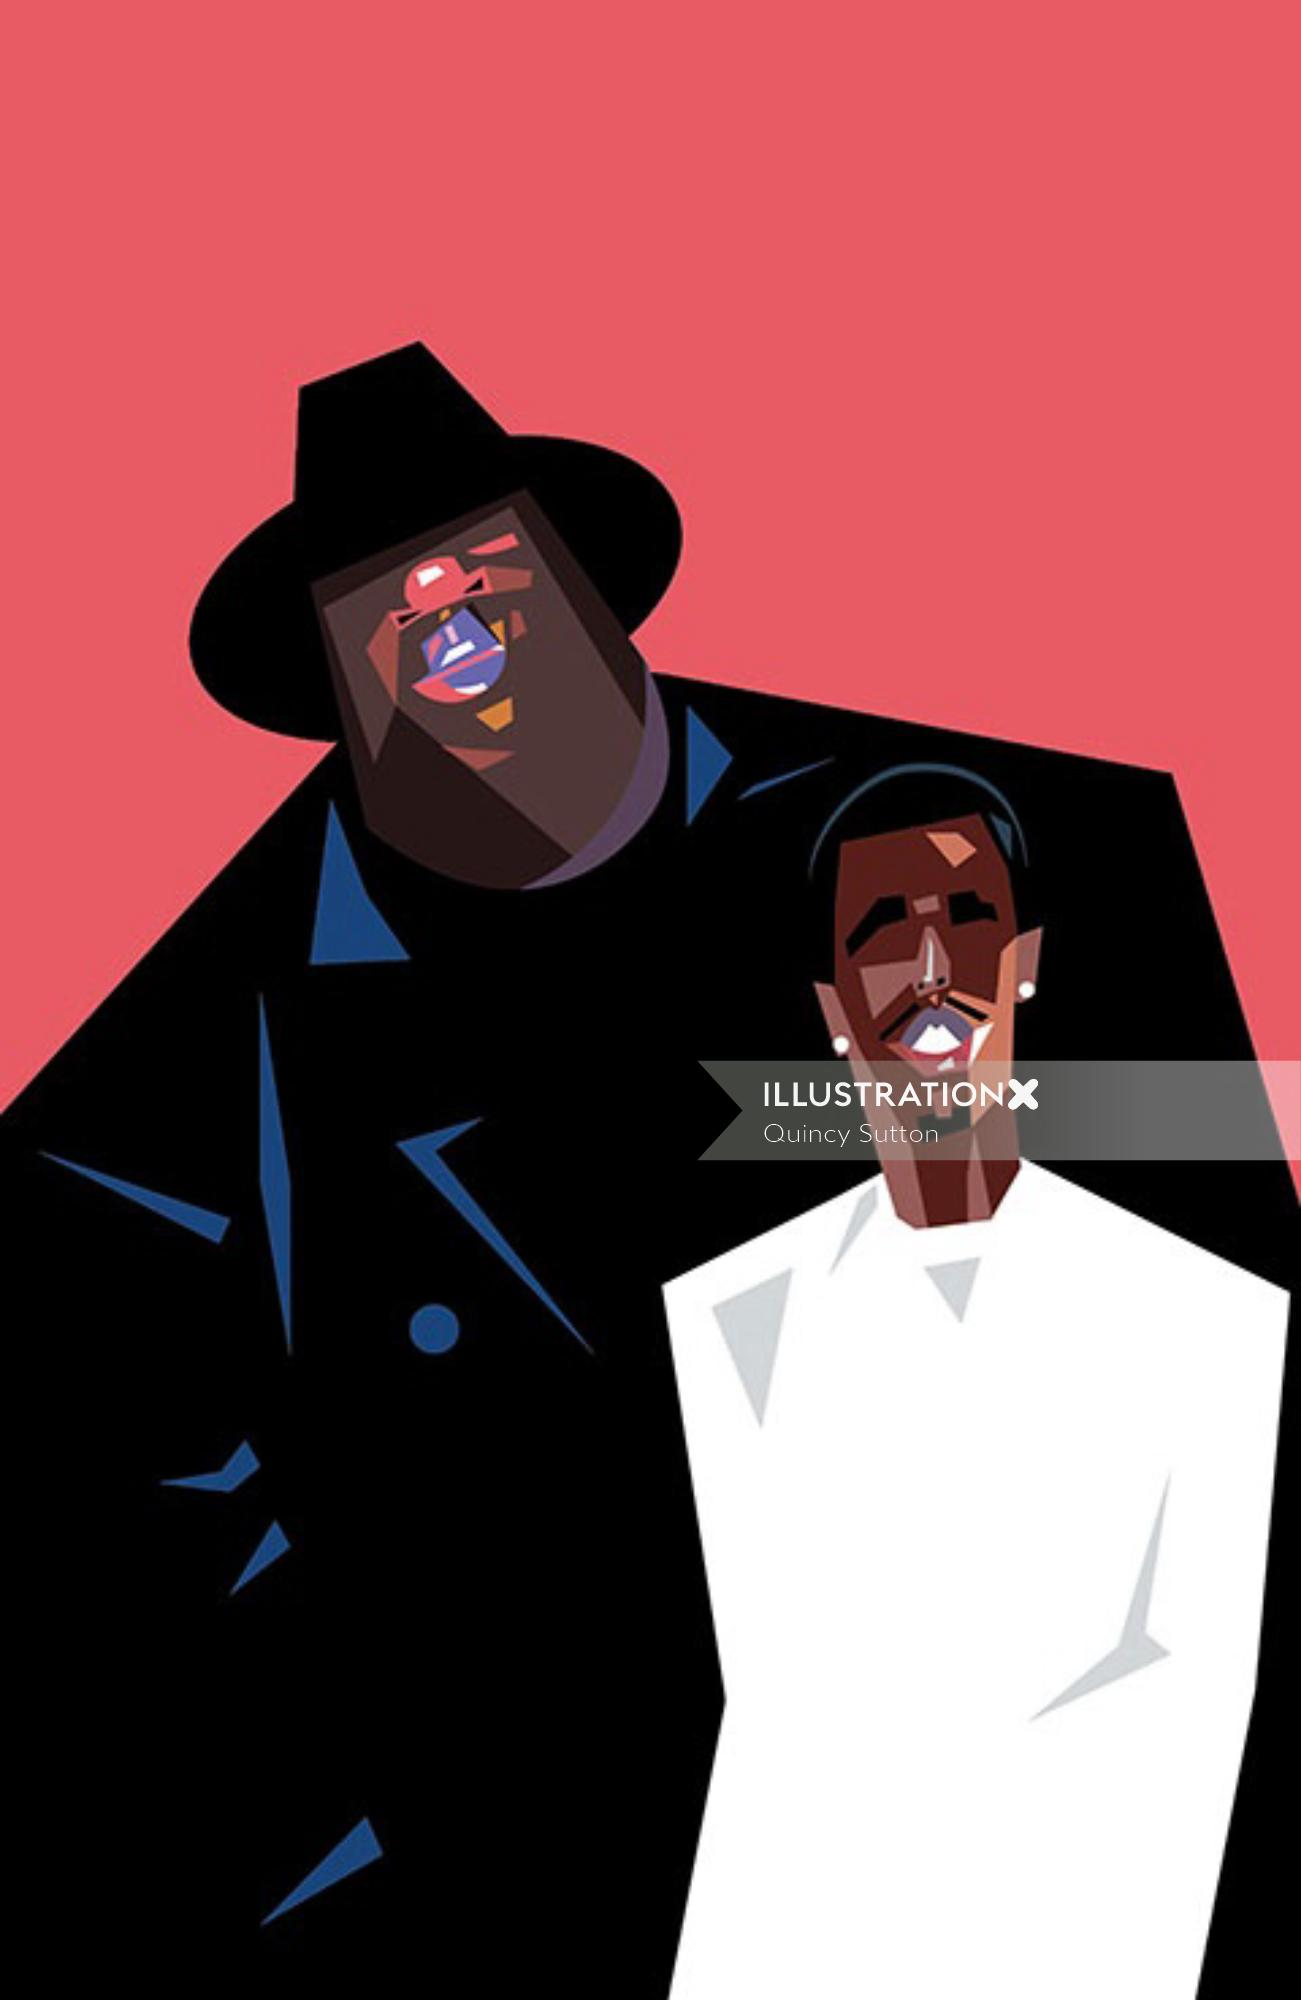 Comic portrait of Biggie and Puff